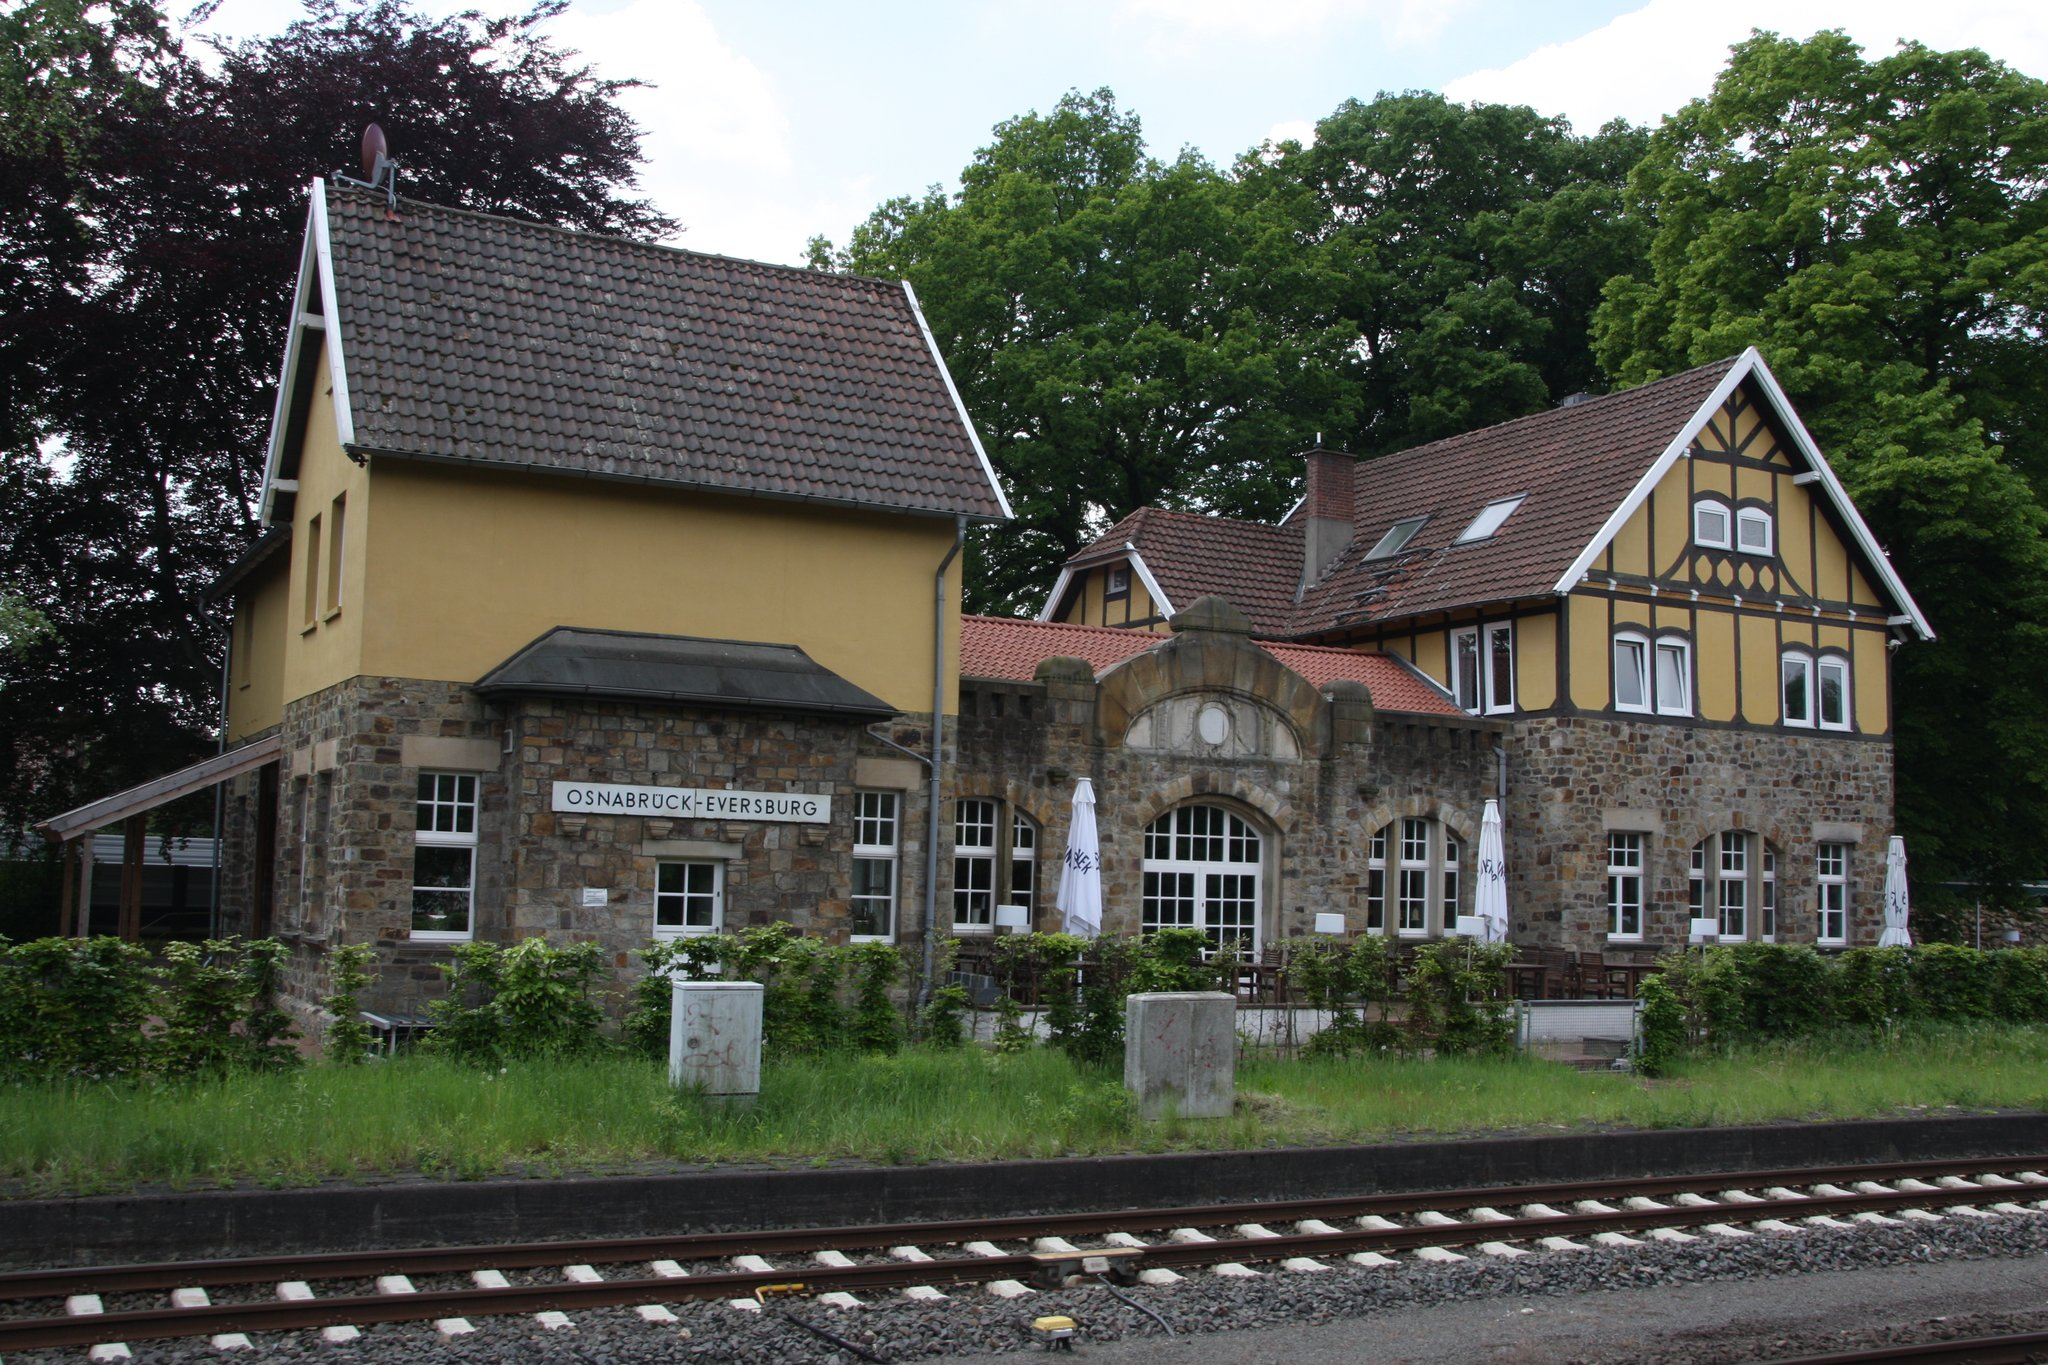 Eversburg